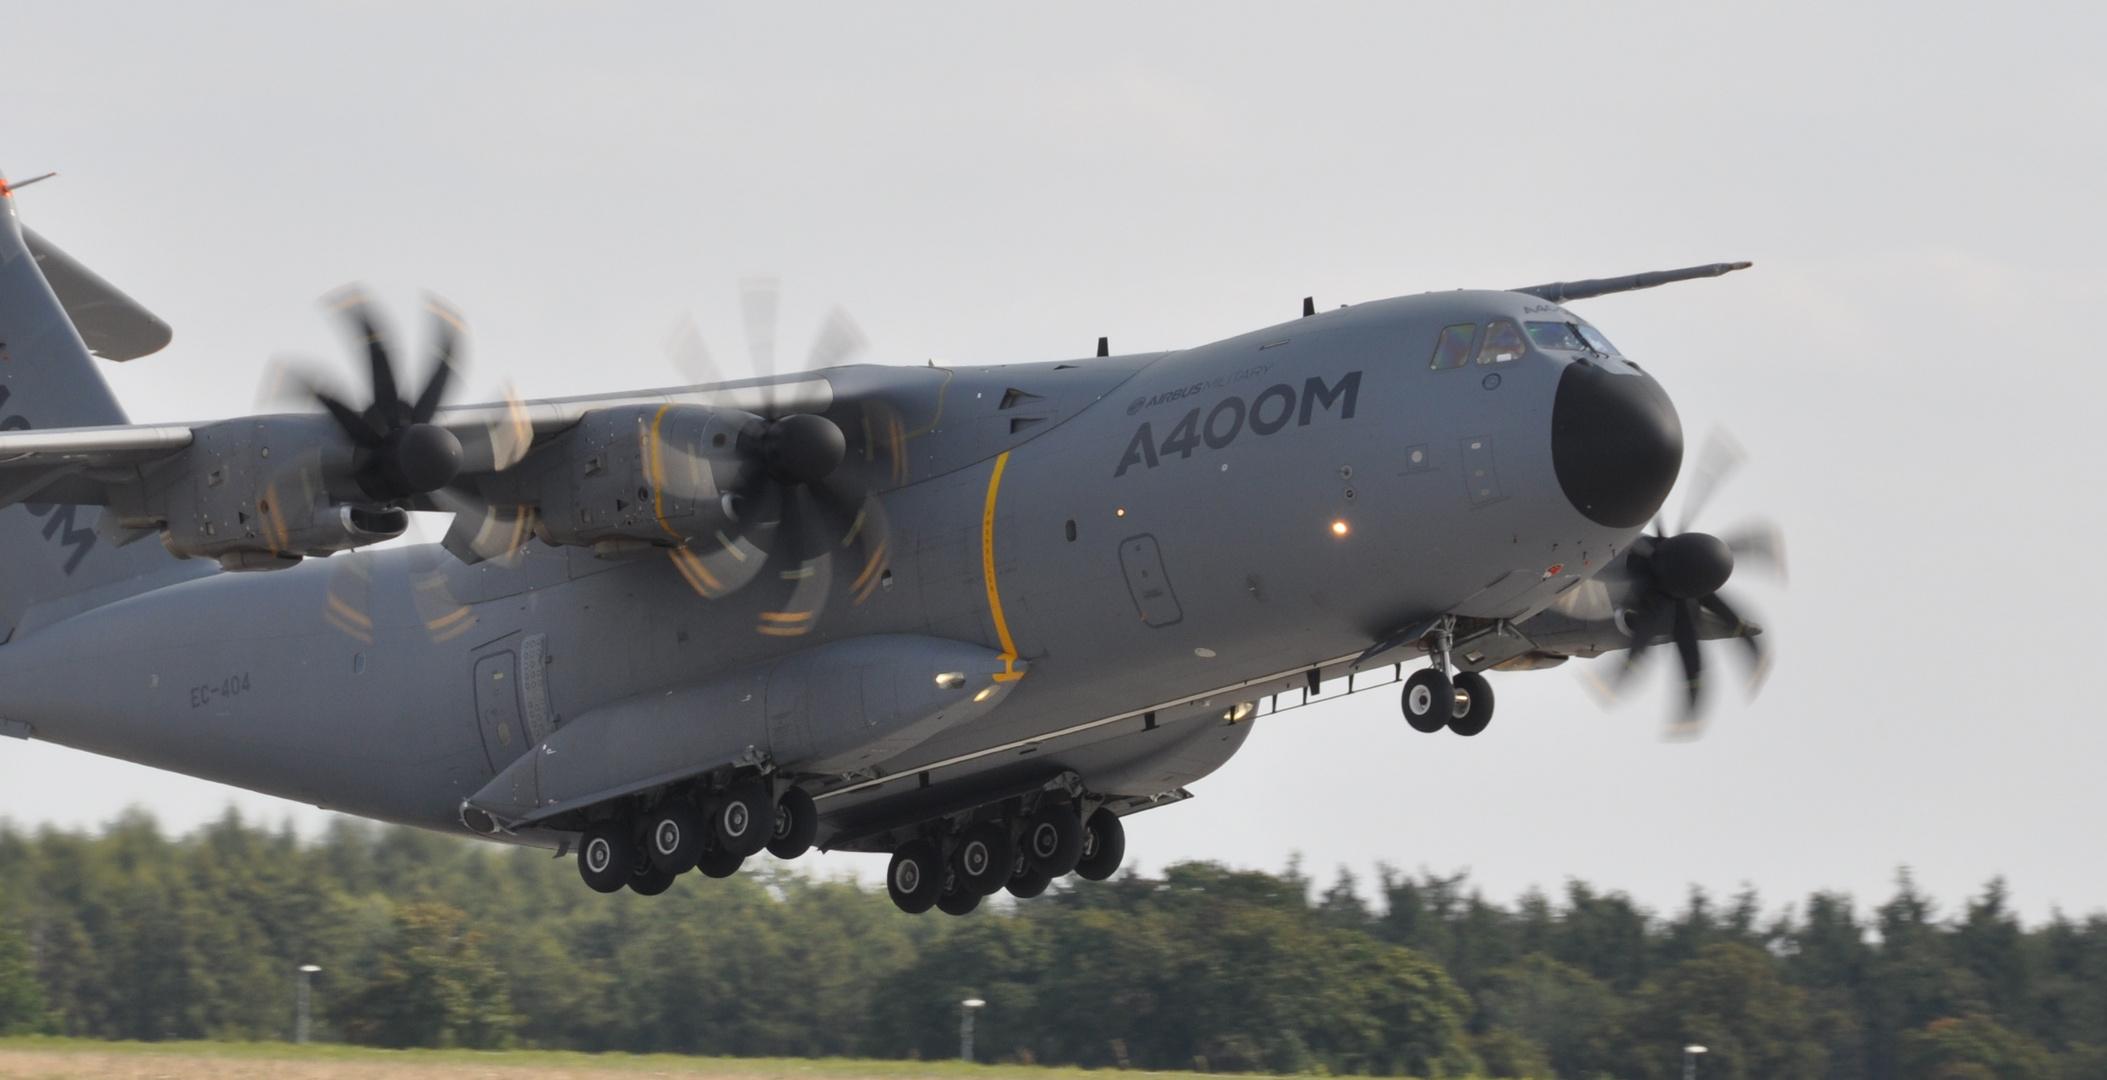 Airbus A400M I